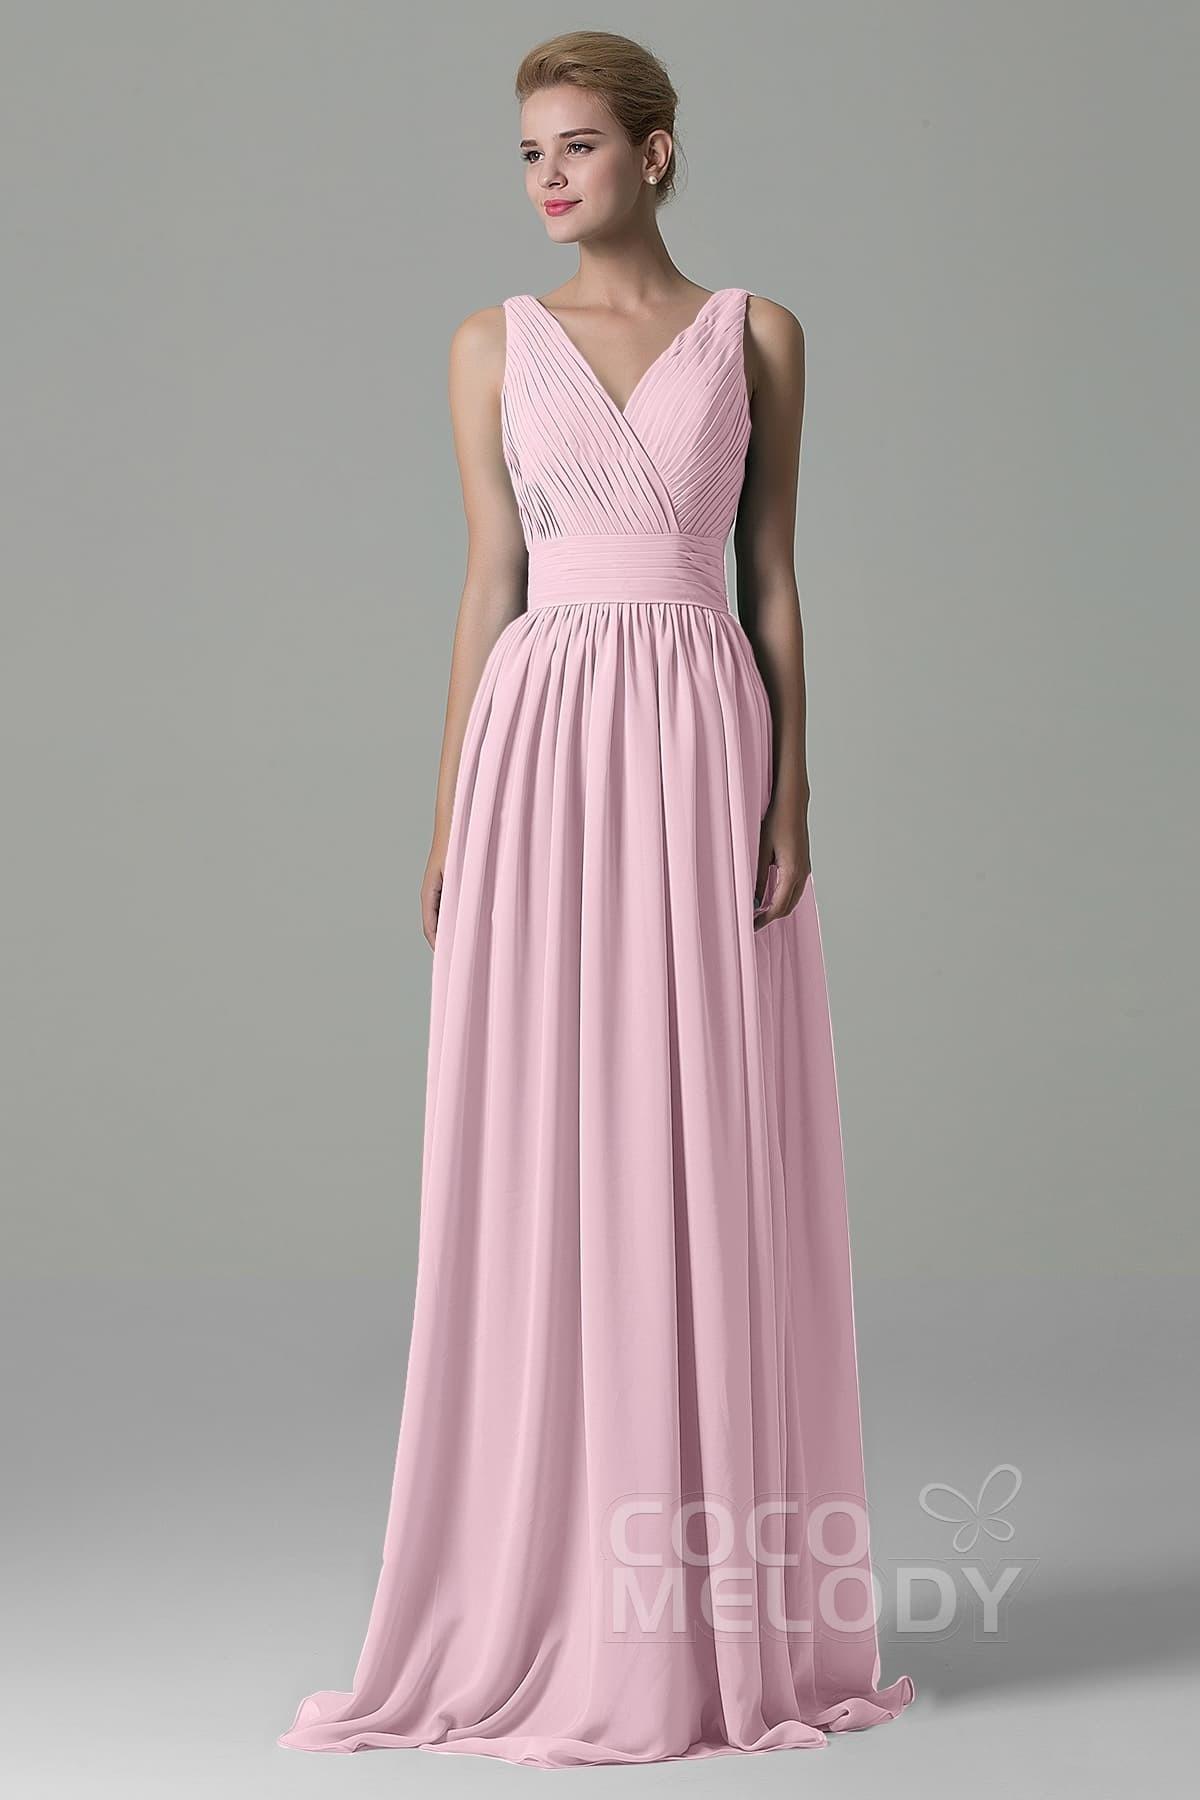 2938b448d1c Unique Sheath-Column V-Neck Natural Floor Length Chiffon Sleeveless Open  Back Bridesmaid Dress